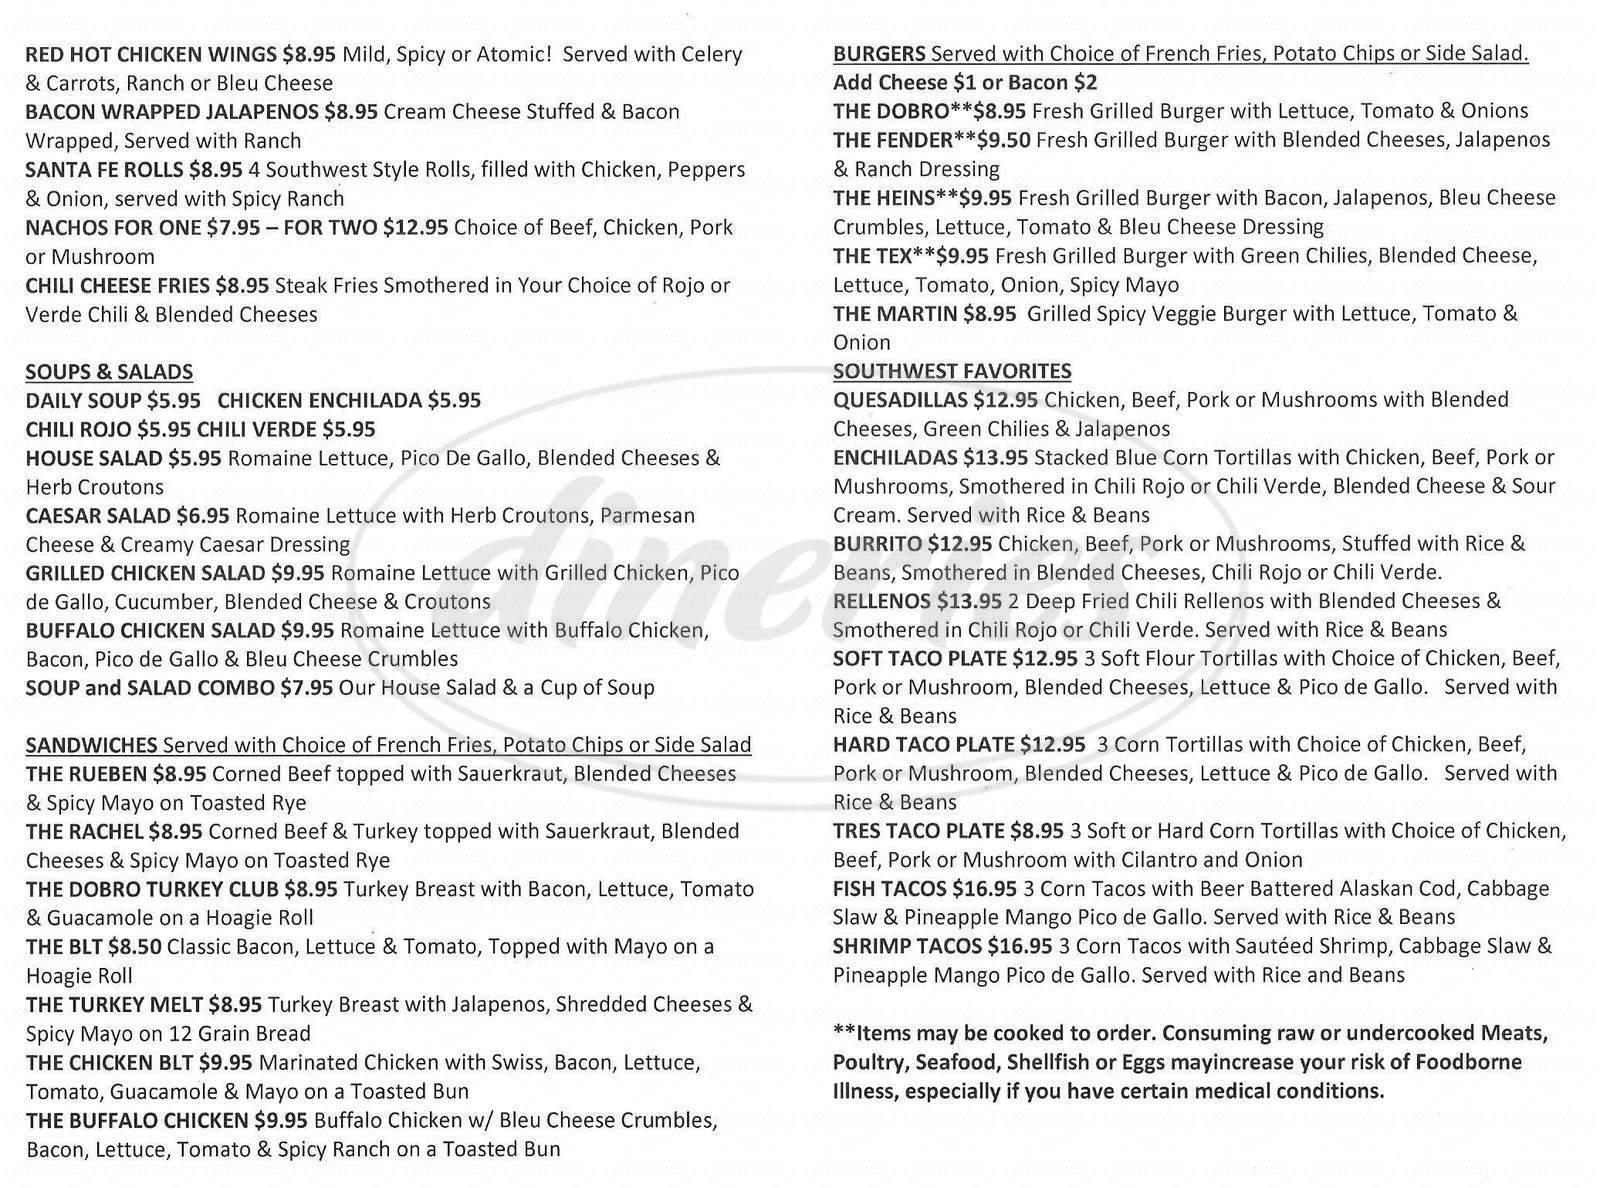 menu for My Dobro